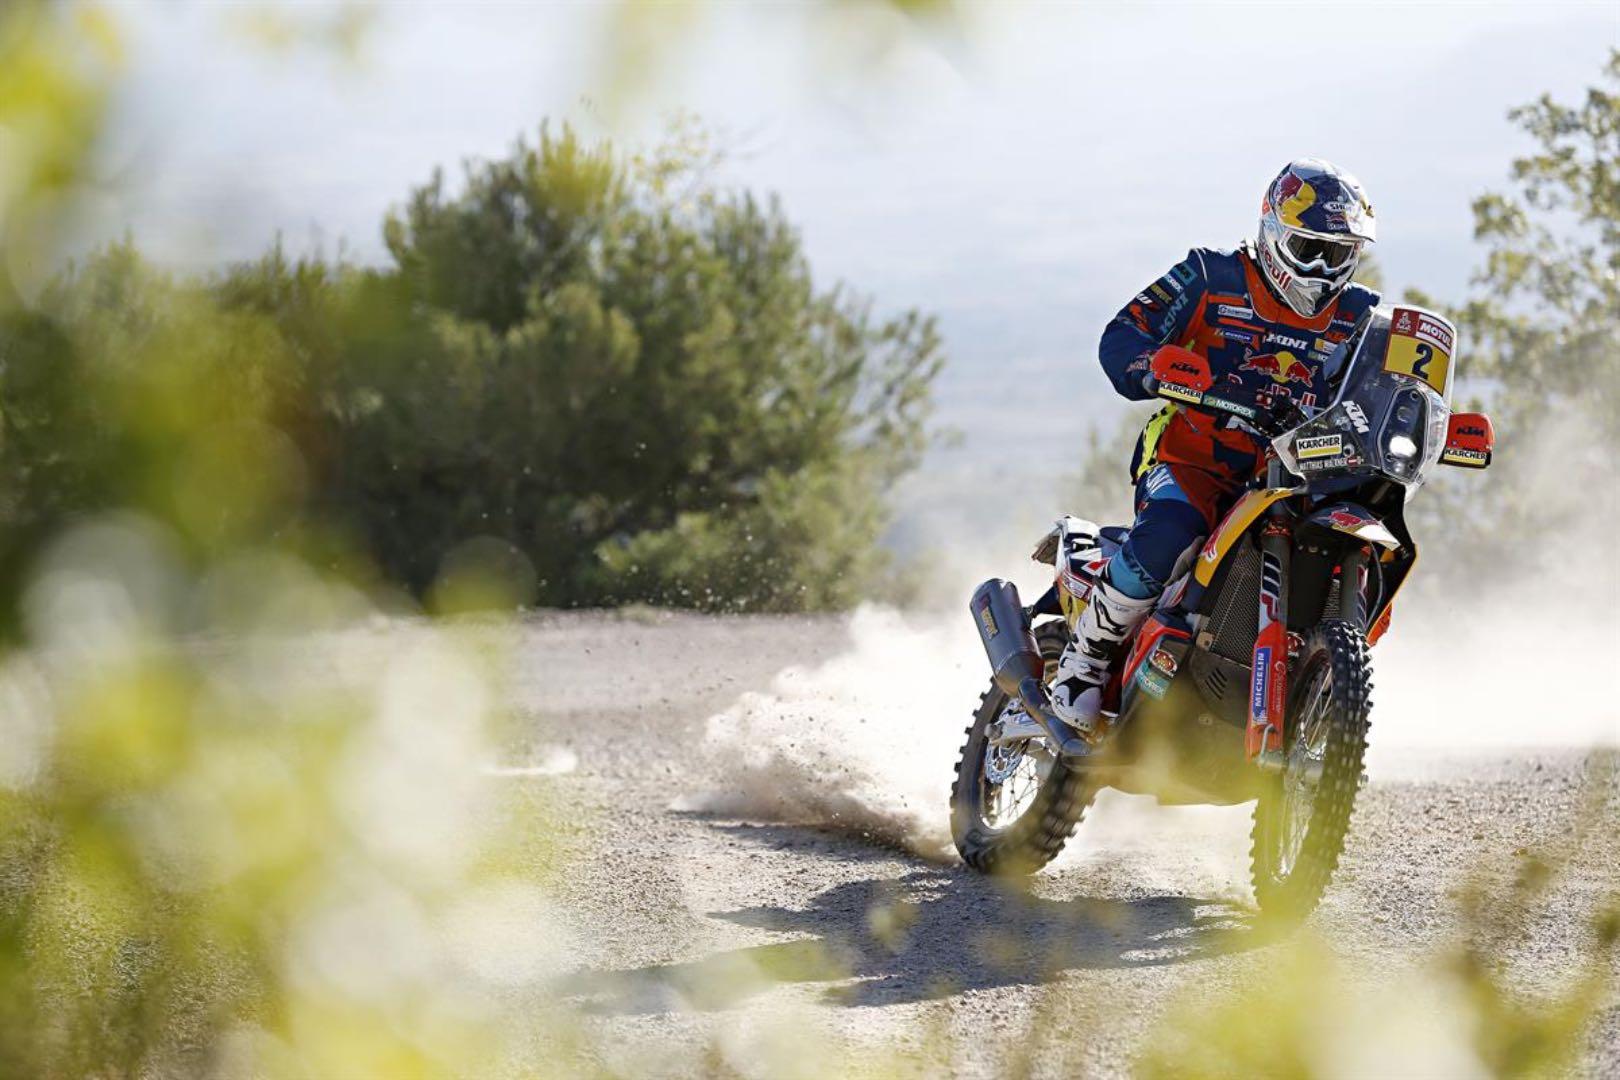 2018 Dakar Rally Motorcycle Preview: KTM's Matthias Walkner